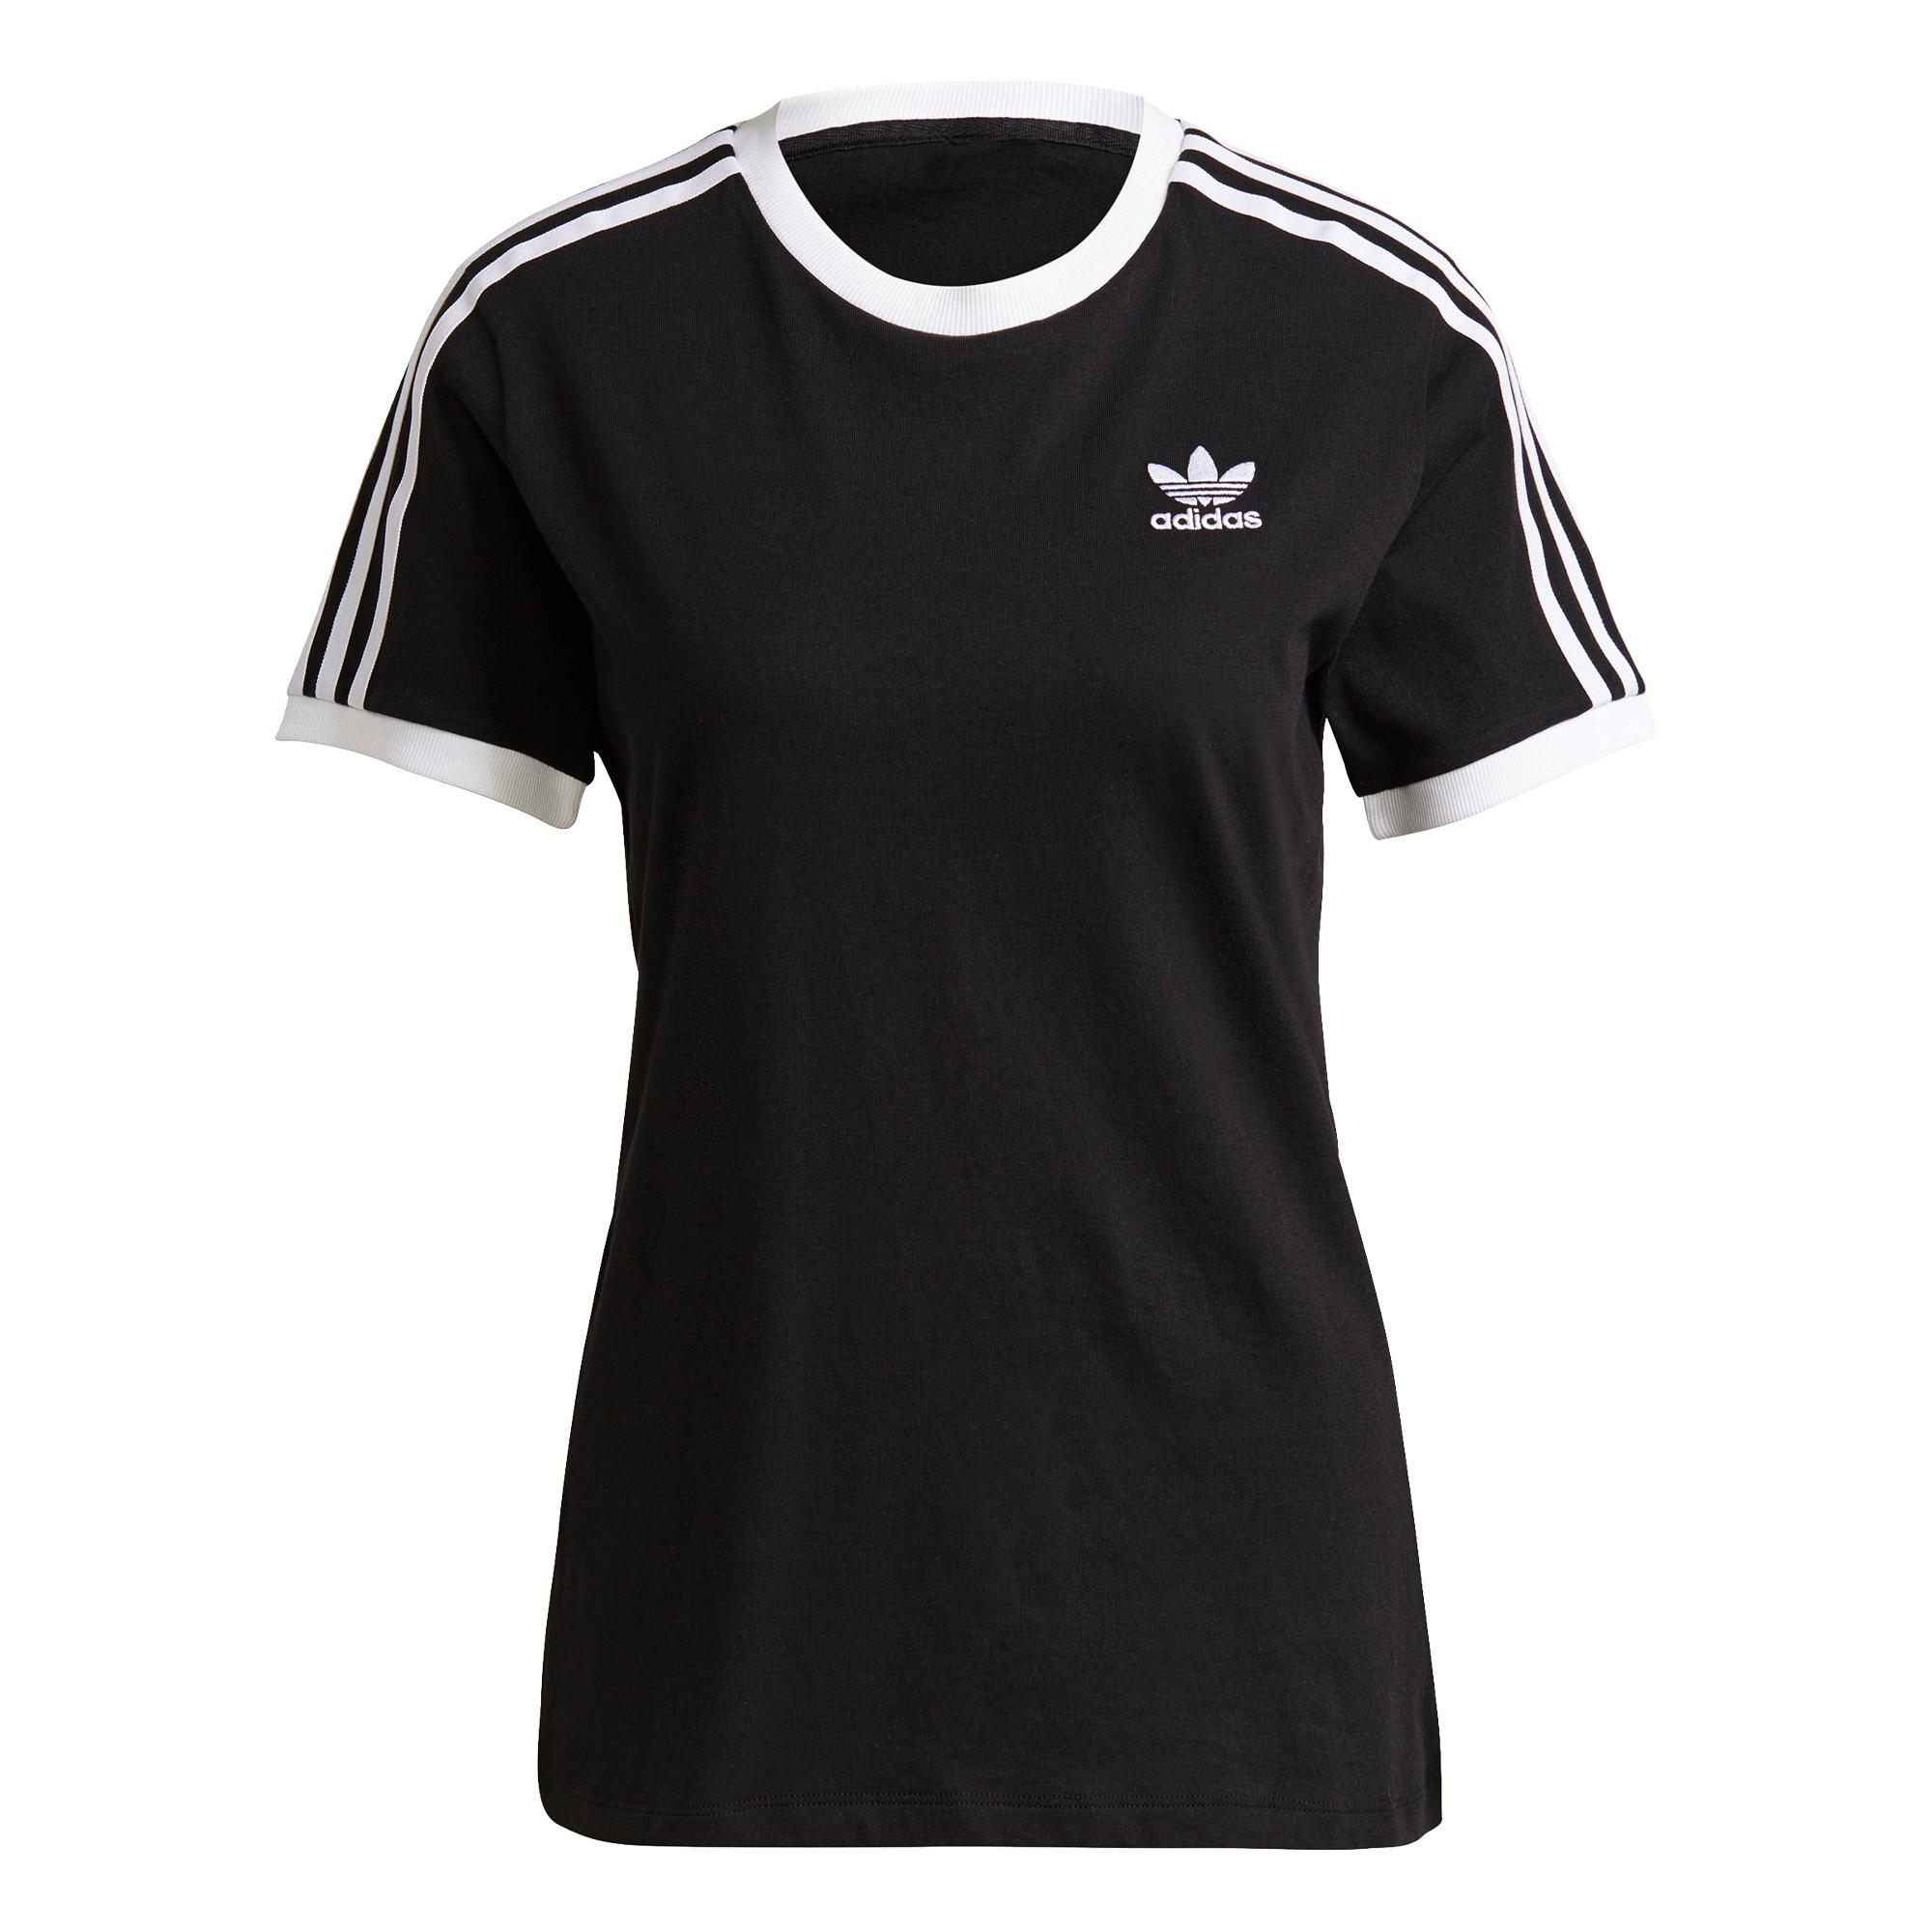 T-shirt adicolor Classics 3-stripes, Nero, large image number 0